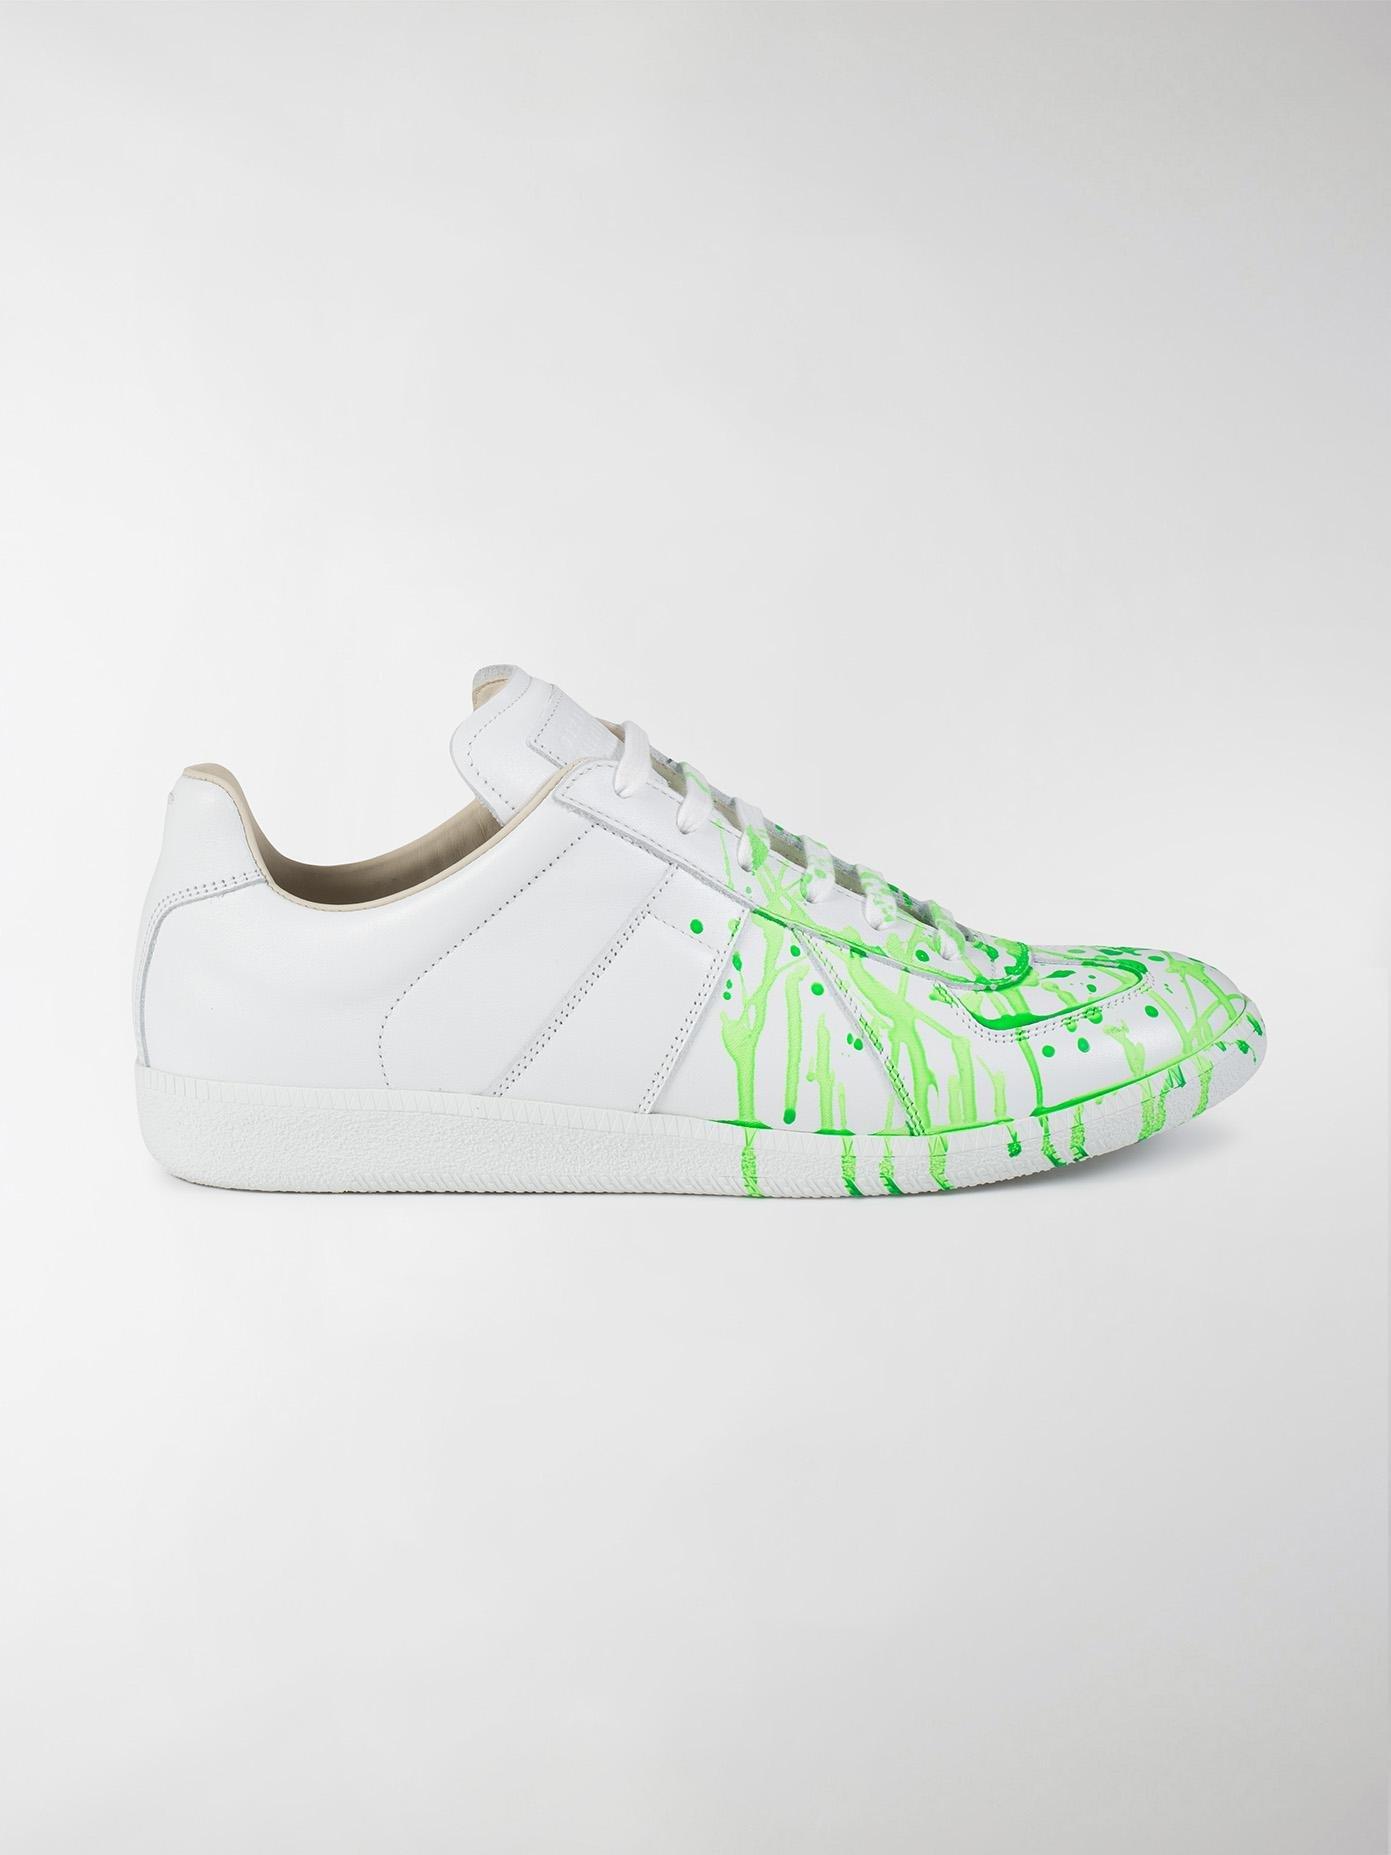 0f37cedc6e3 Maison Margiela Green Replica Paint Splatter Leather Sneakers for men